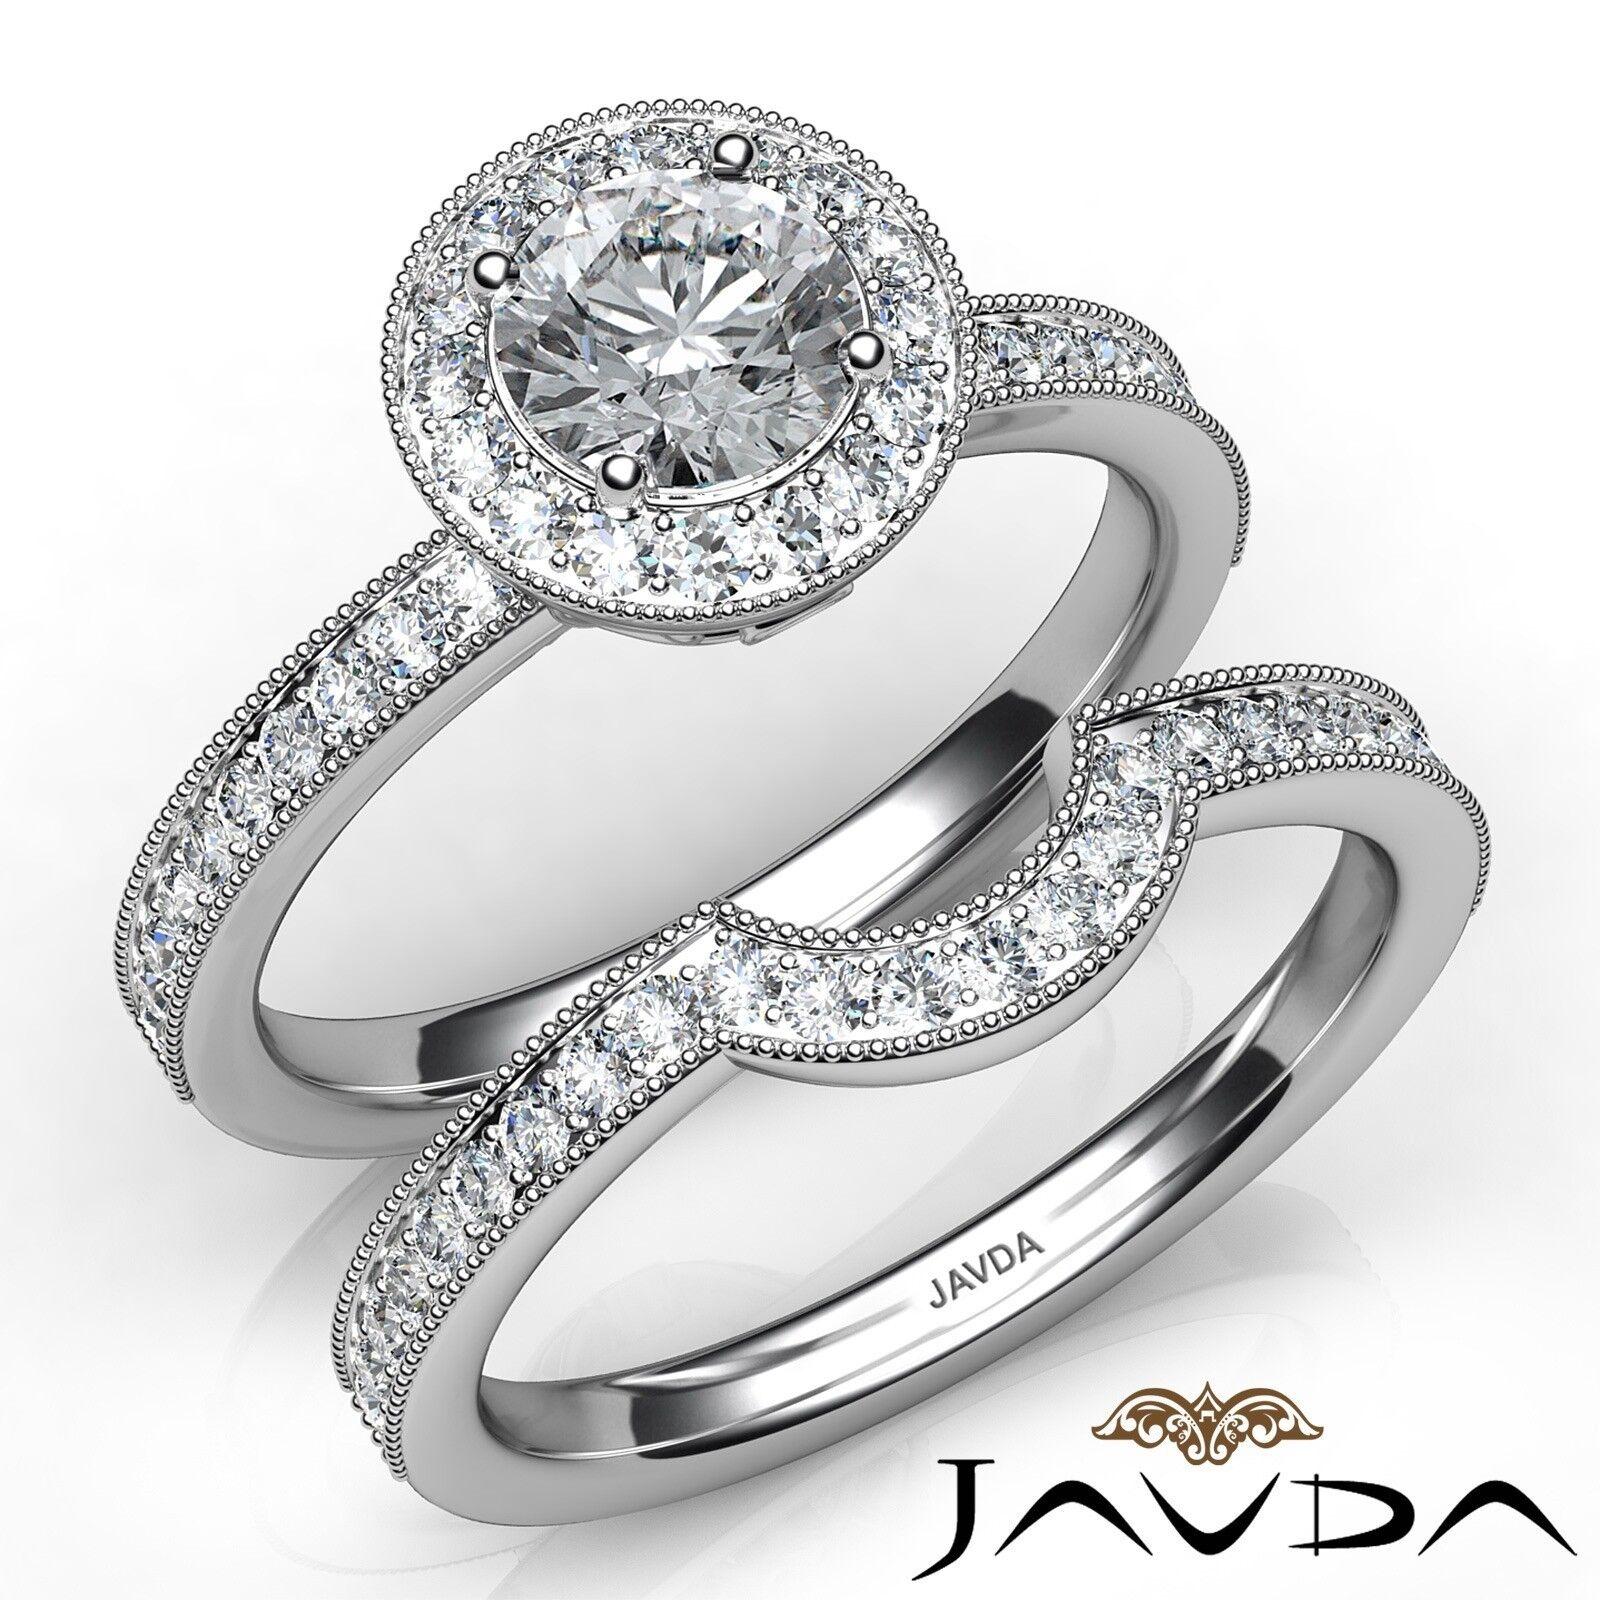 1.5ctw Halo Pave Milgrain Bridal Round Diamond Engagement Ring GIA G-VS2 Gold